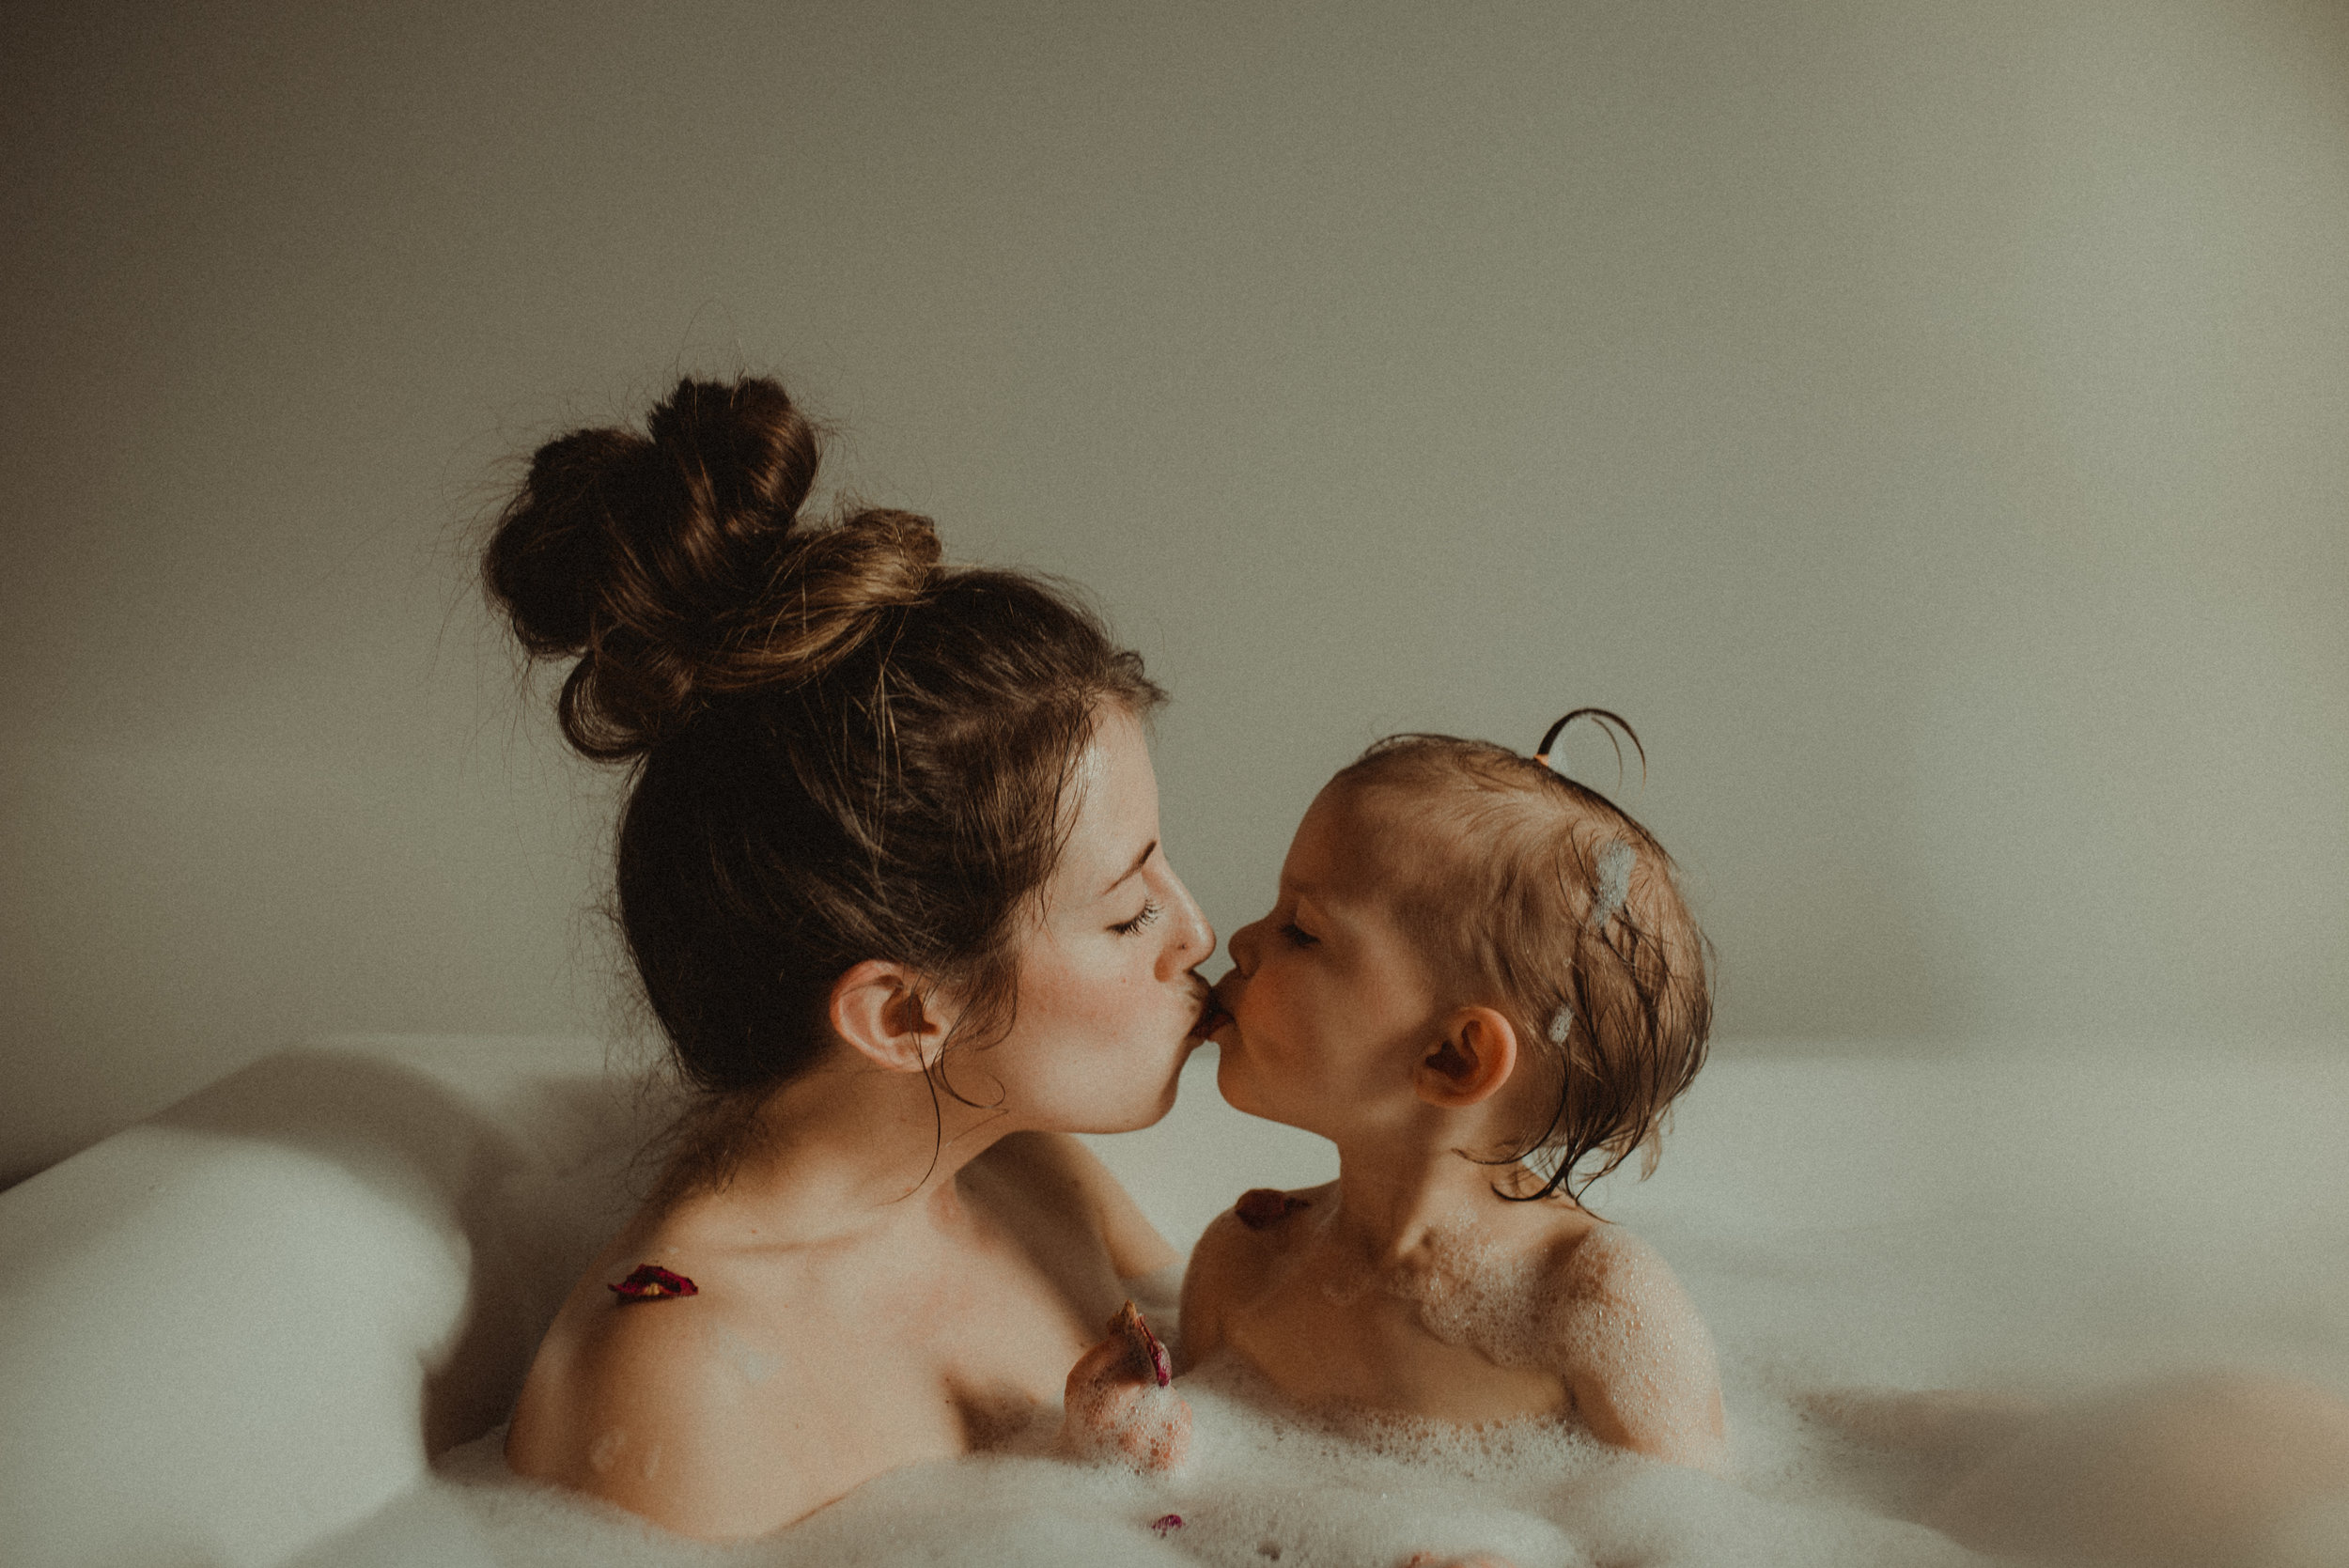 mother, daughter, bubble bath, lethbridge, alberta